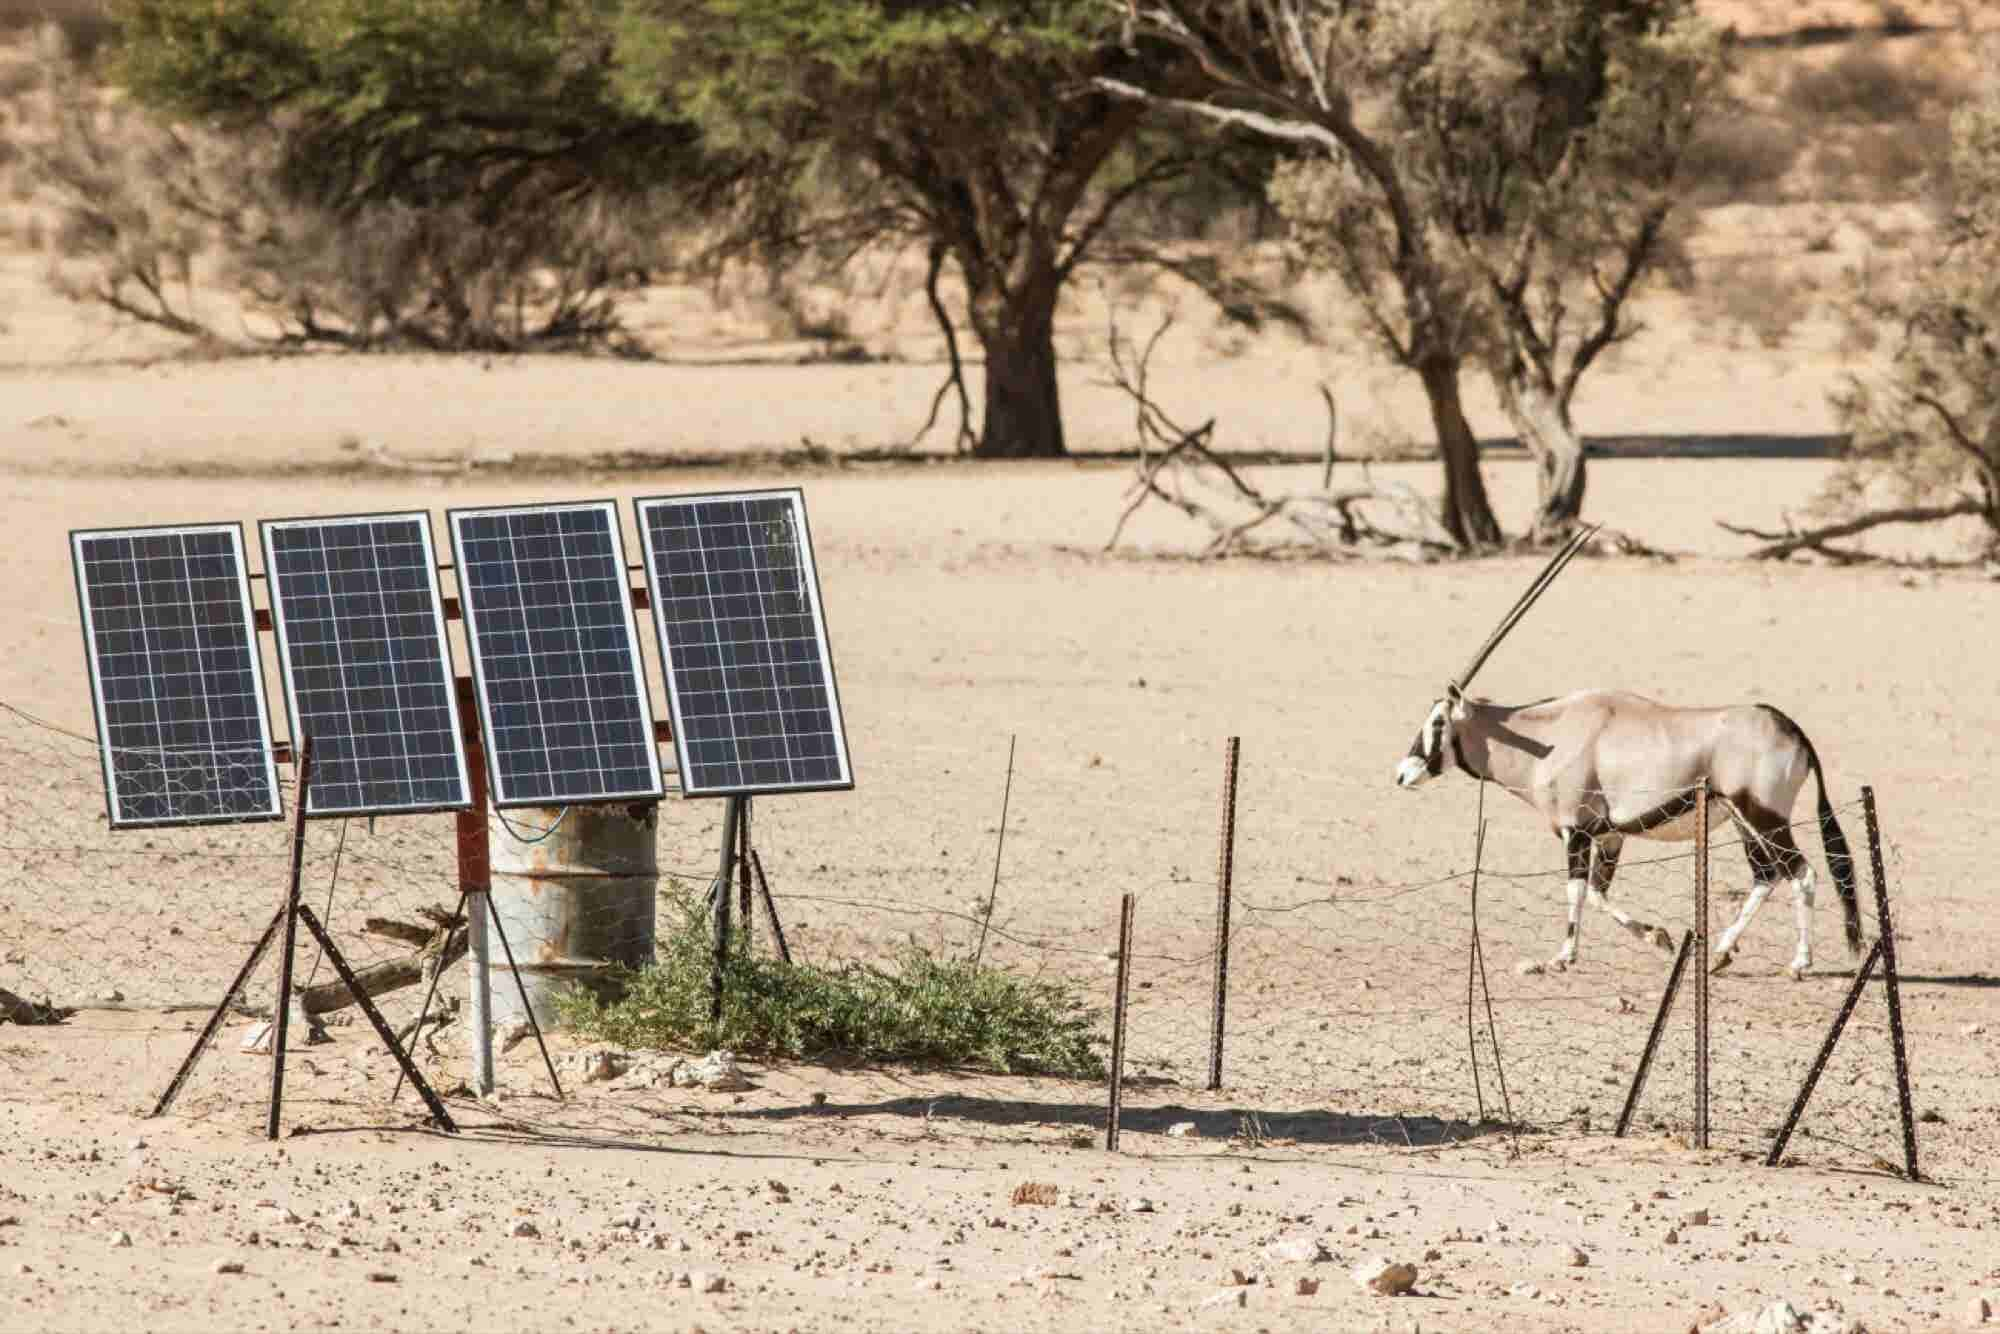 4 Lessons for Entrepreneurs From Africa's Solar Industry